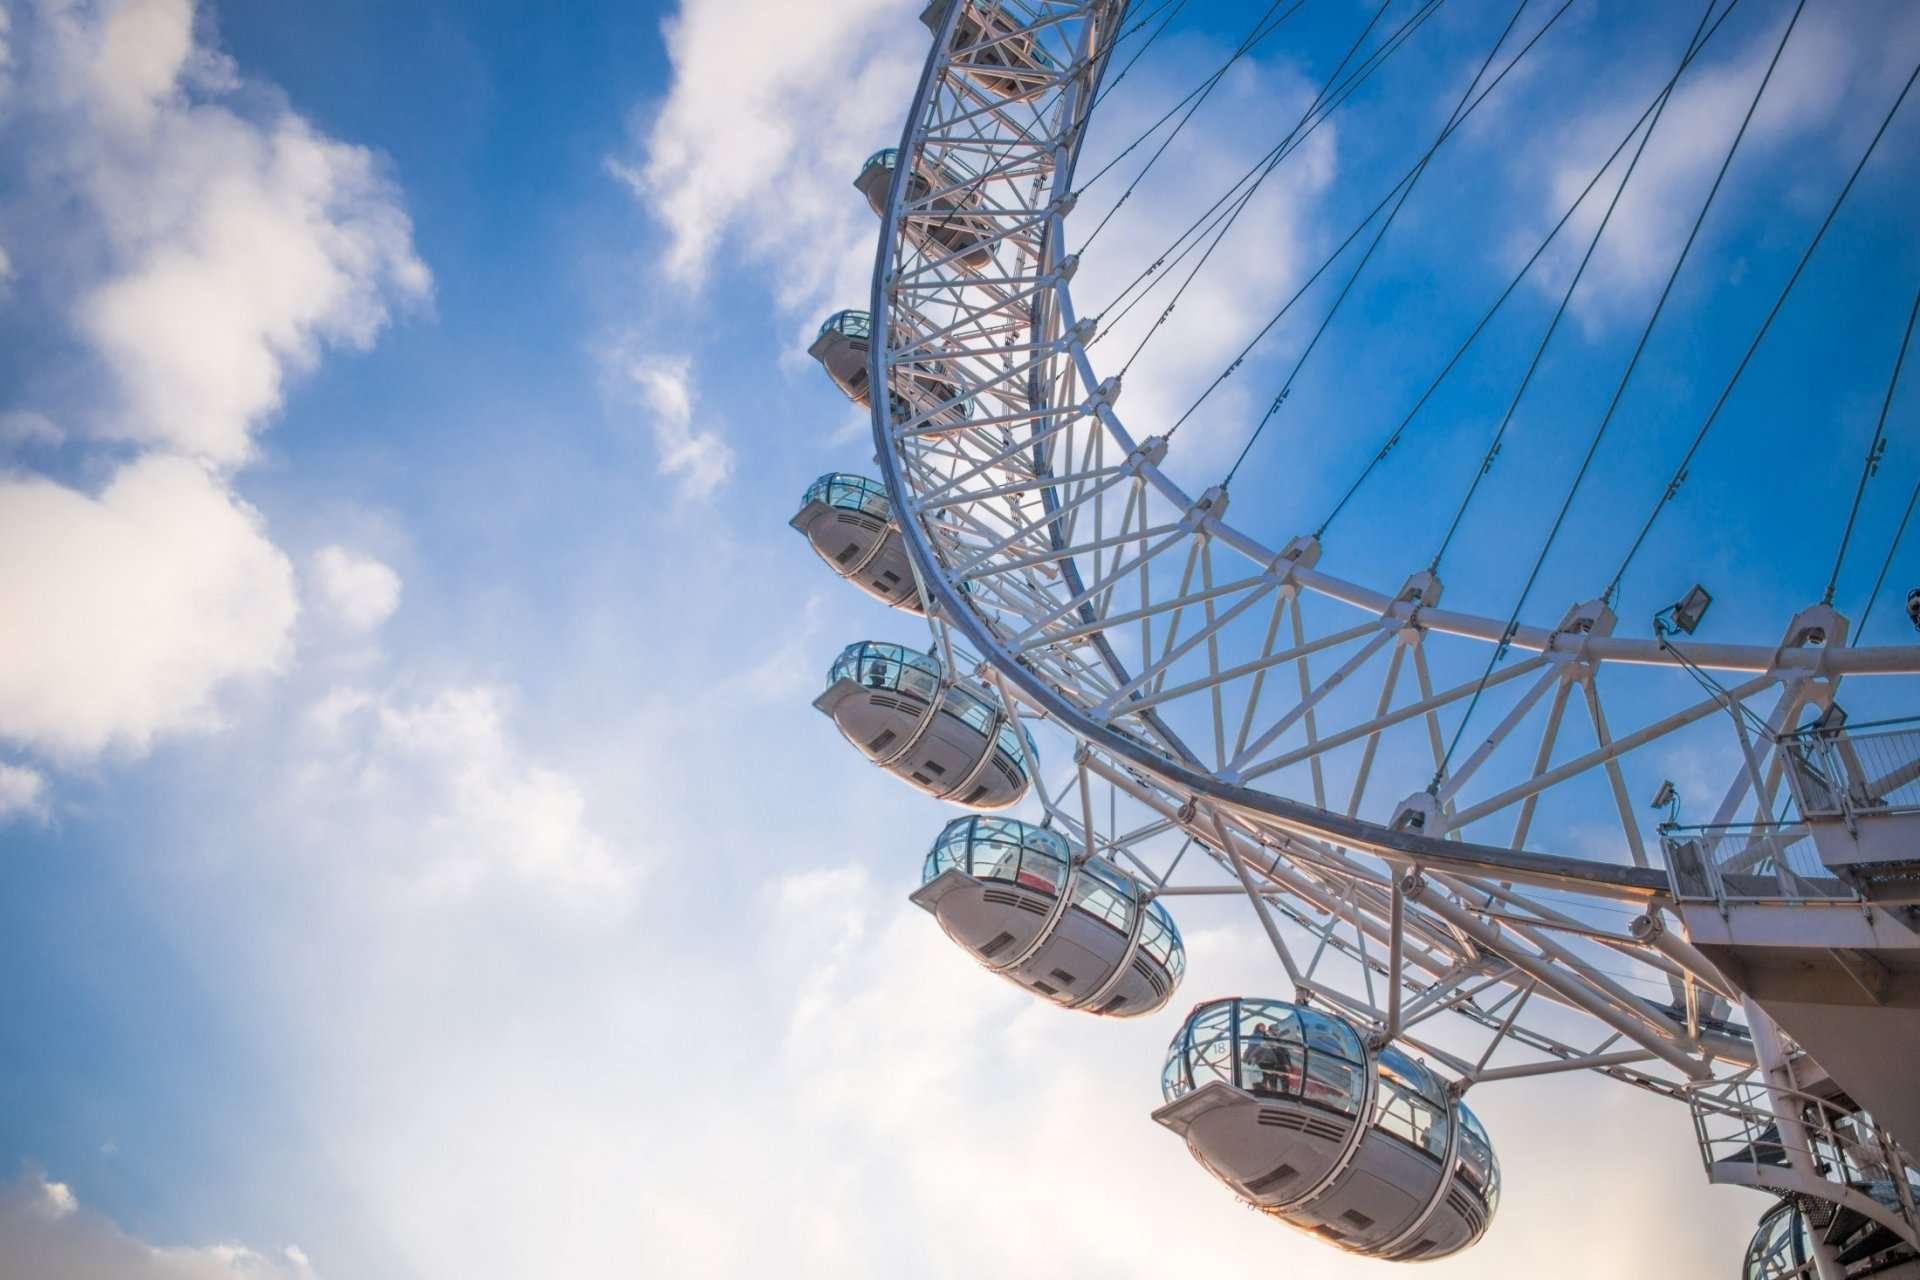 the London Eye on a blue sky day